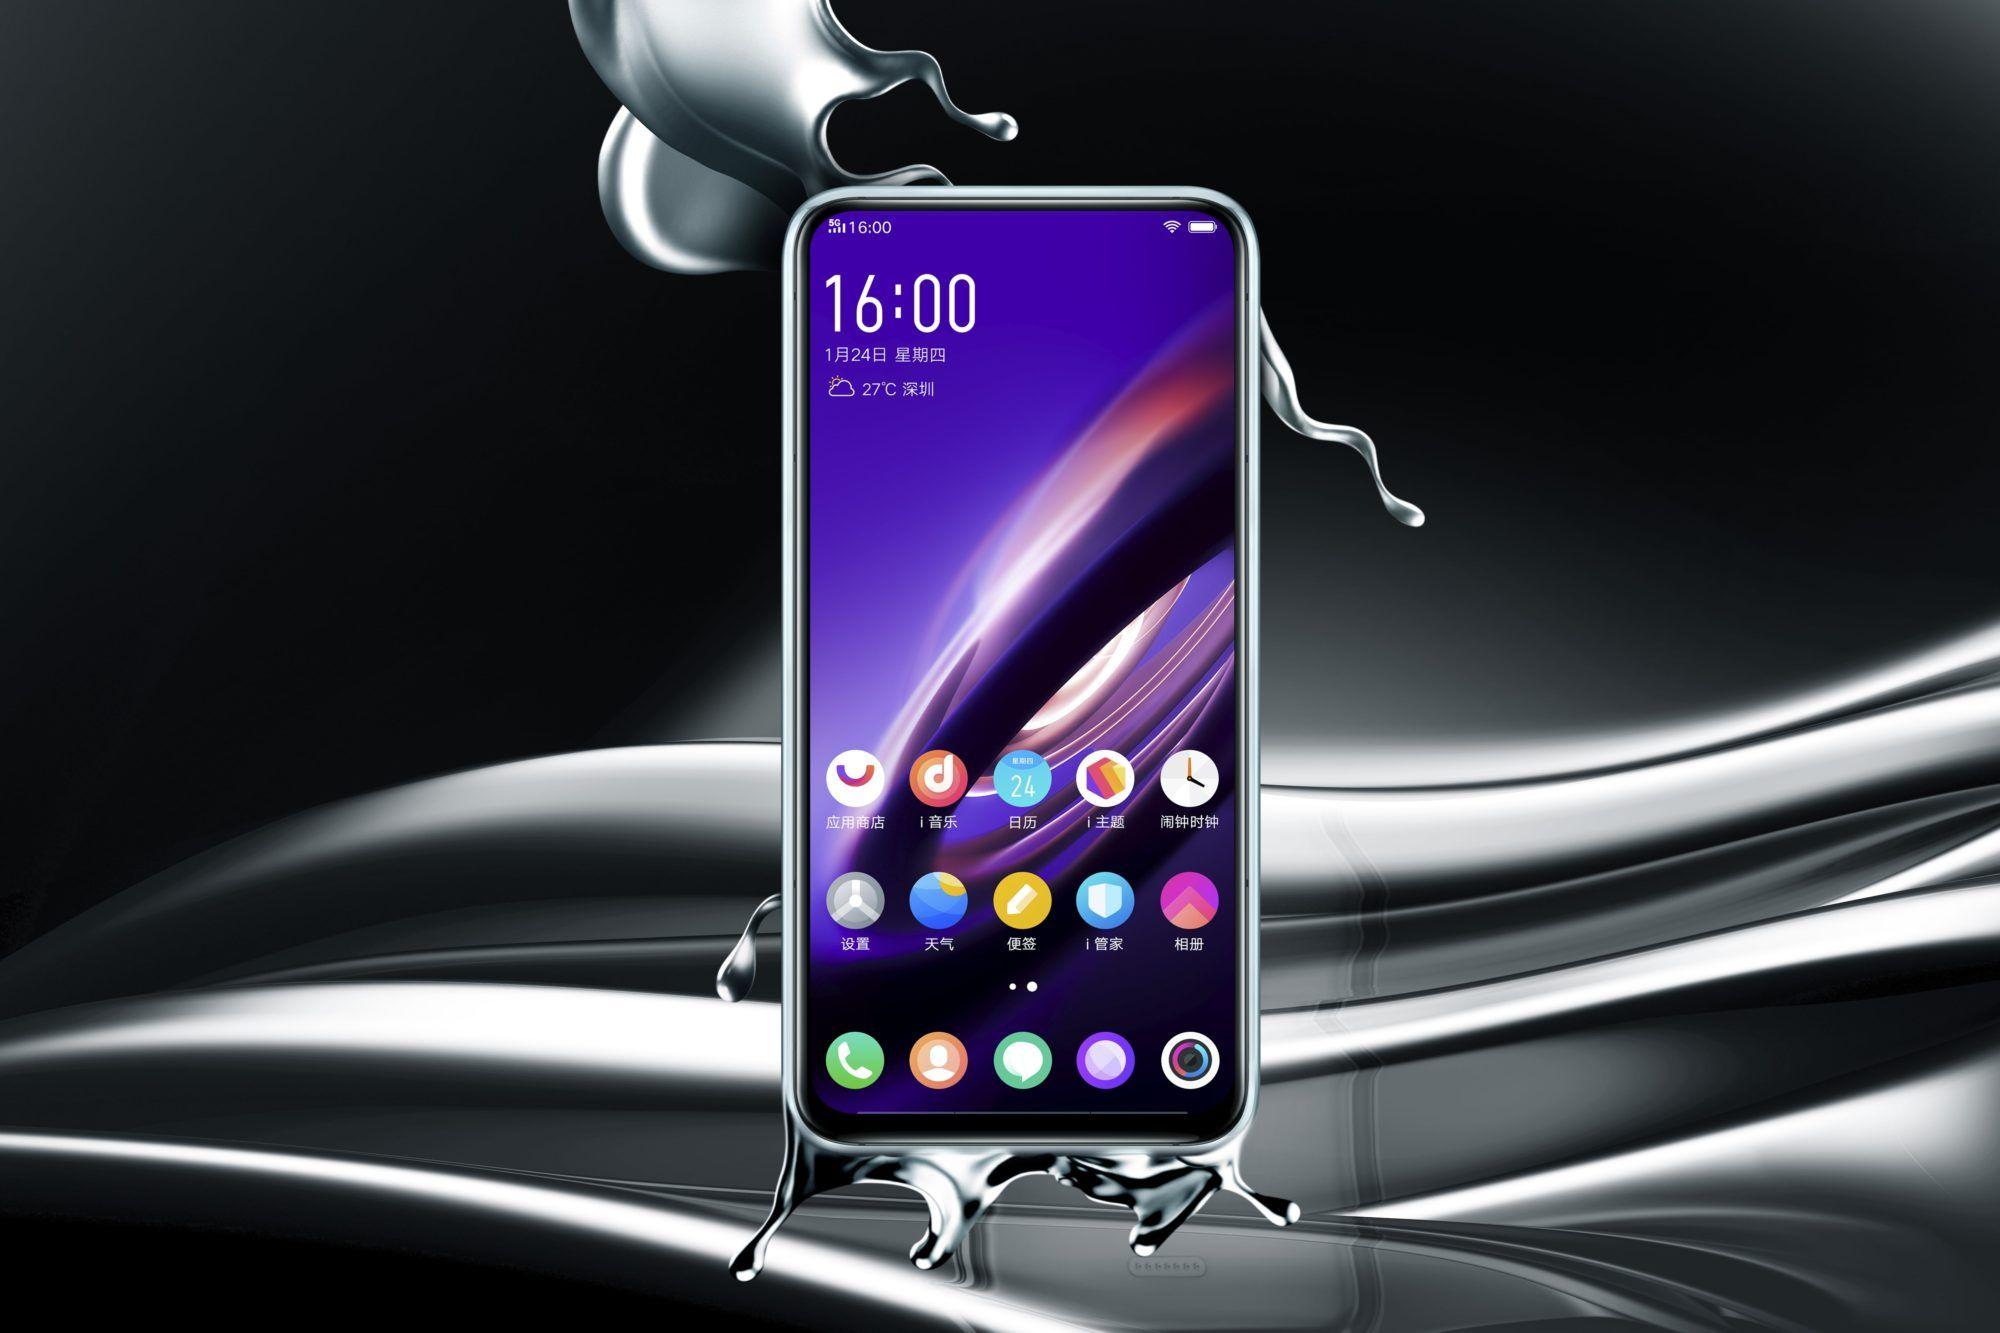 Vivo Unveils the New Futuristic APEX 2019 Concept